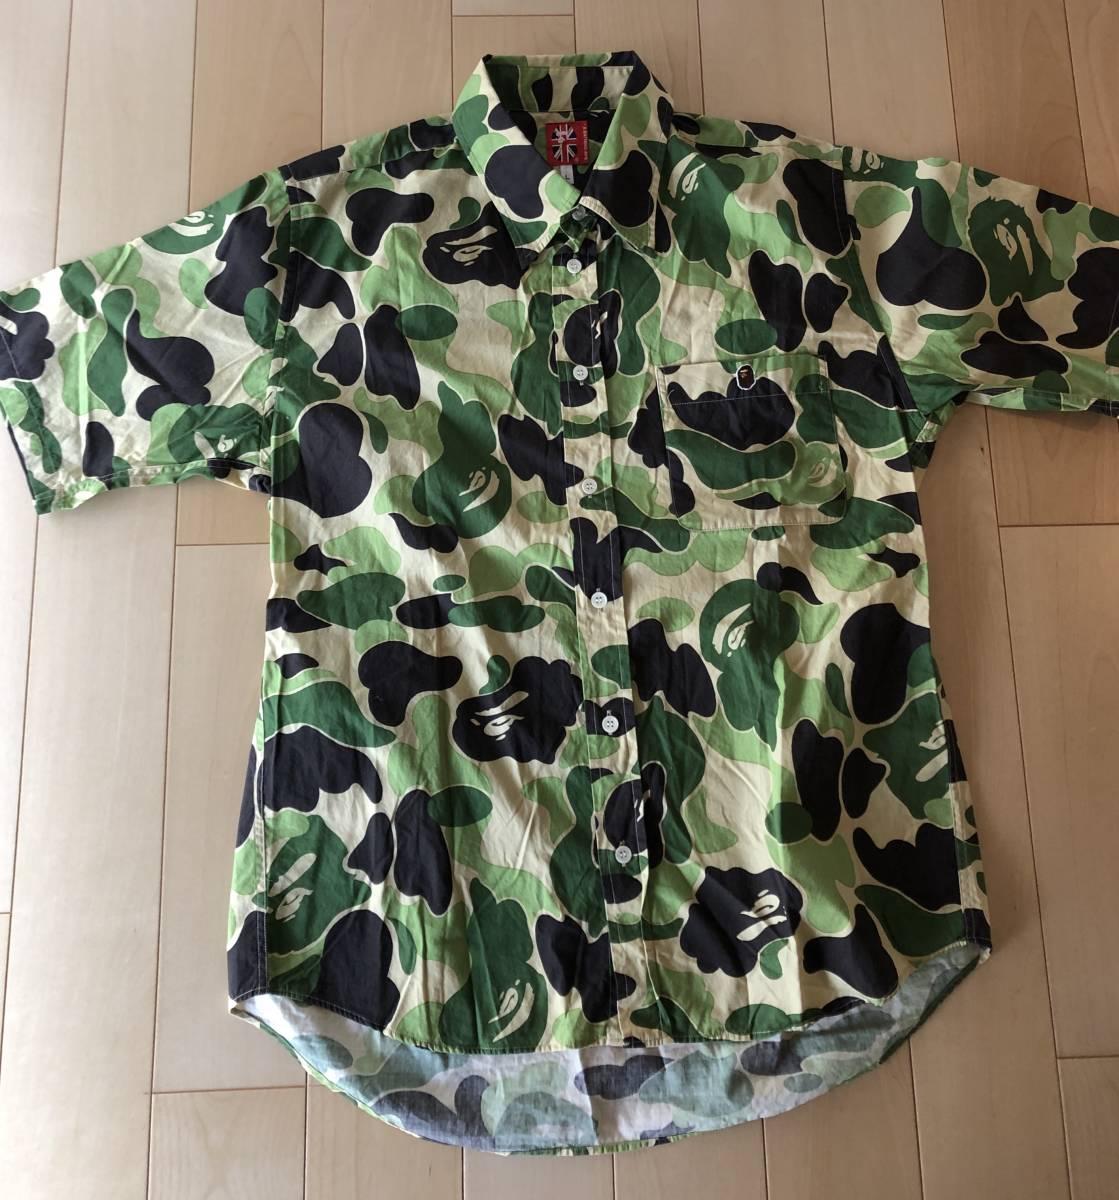 A BATHING APE/ア ベイシングエイプ サルカモ 猿 迷彩柄 半袖シャツ サイズL